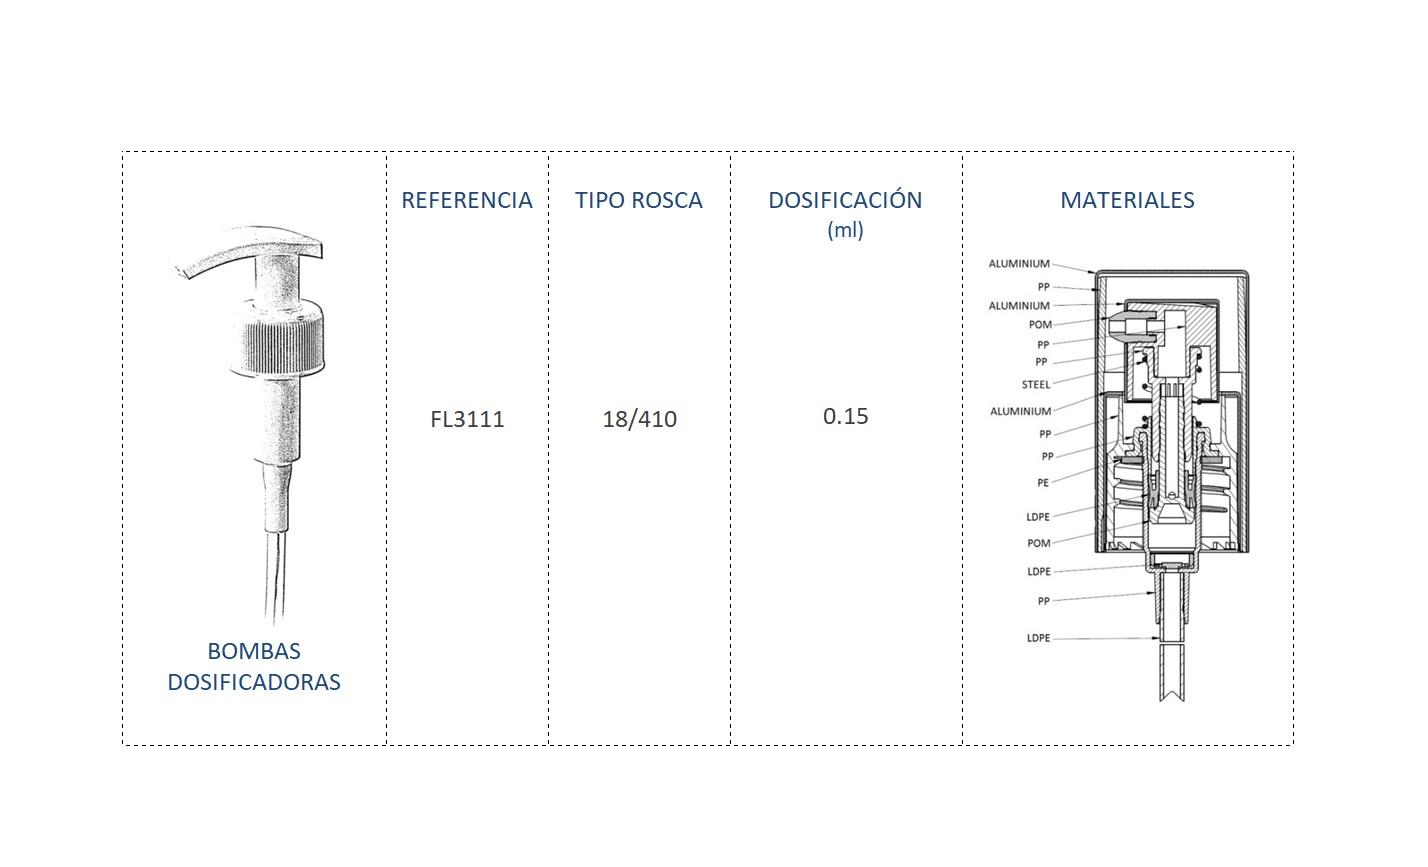 Cuadro de materiales bomba dosificadora FL3111 18/410